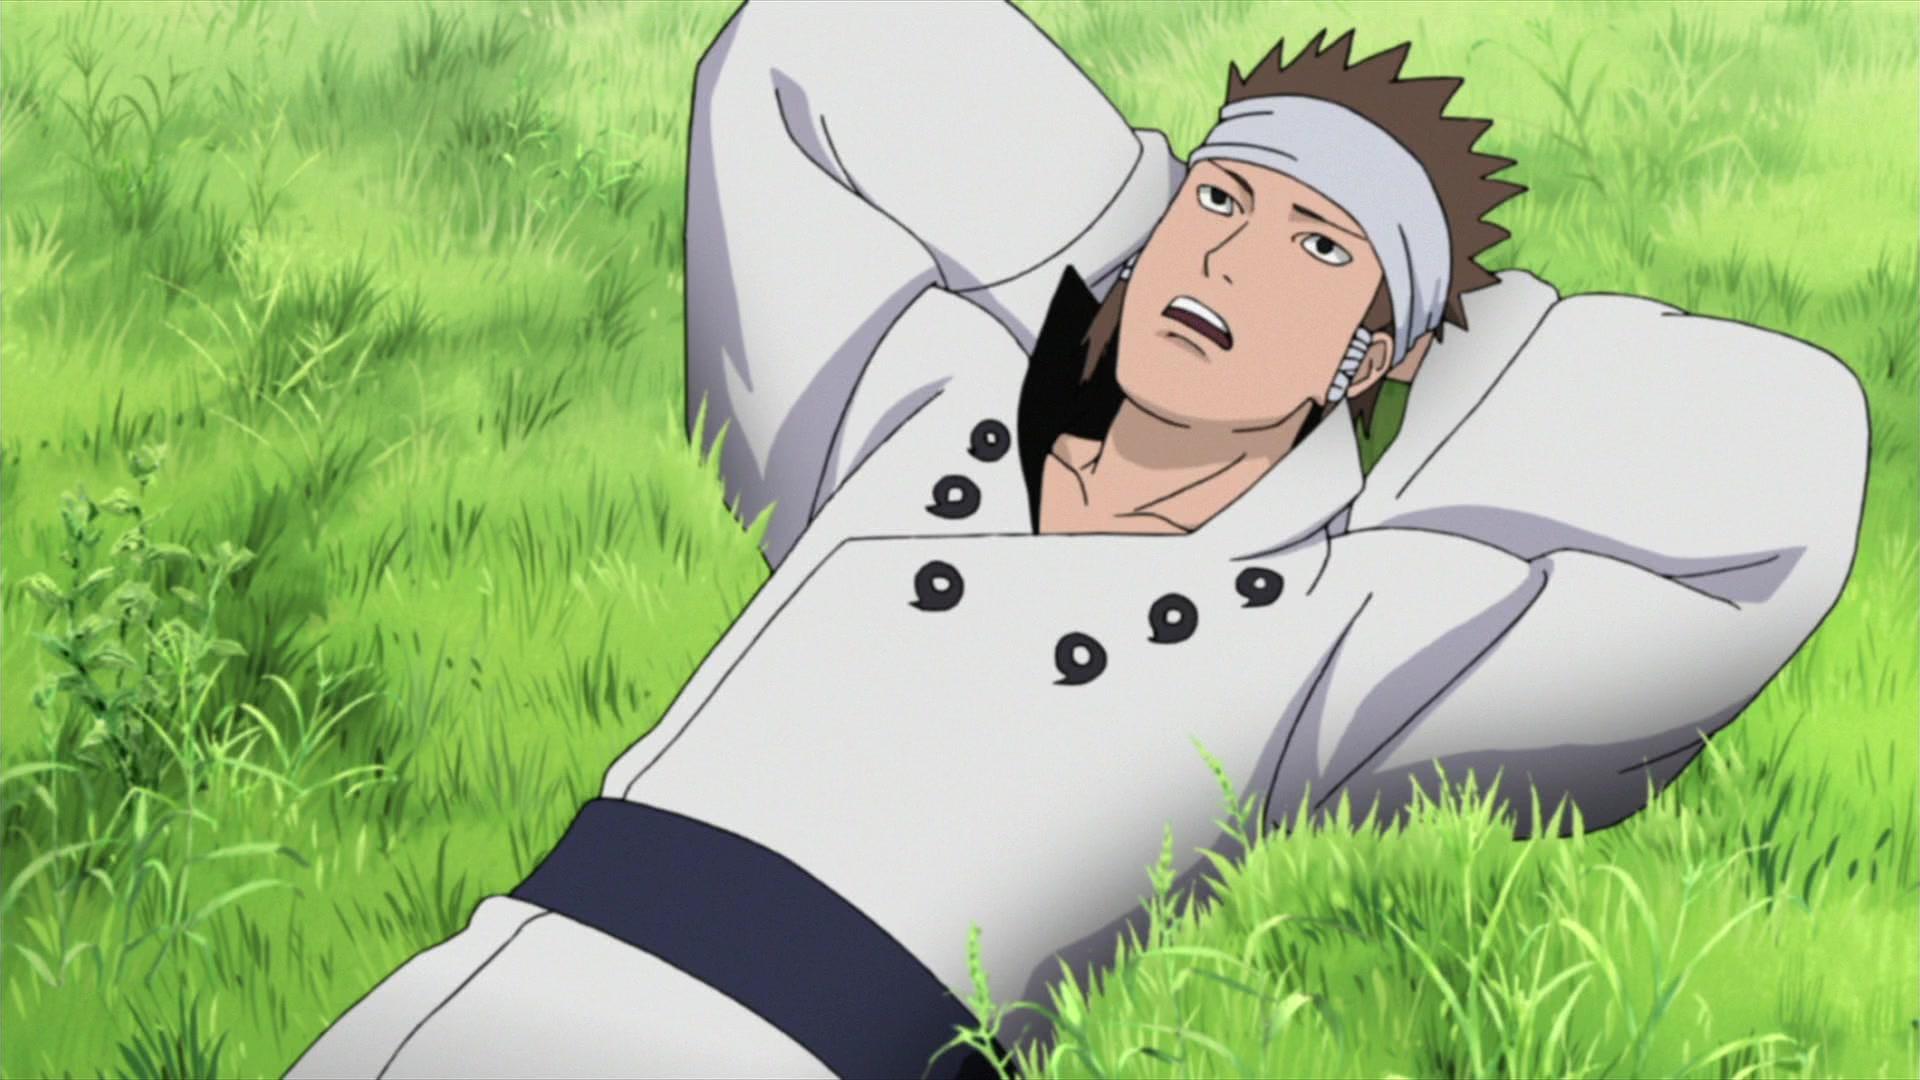 Naruto Shippuden: Season 17 Episode 466, The Tumultuous